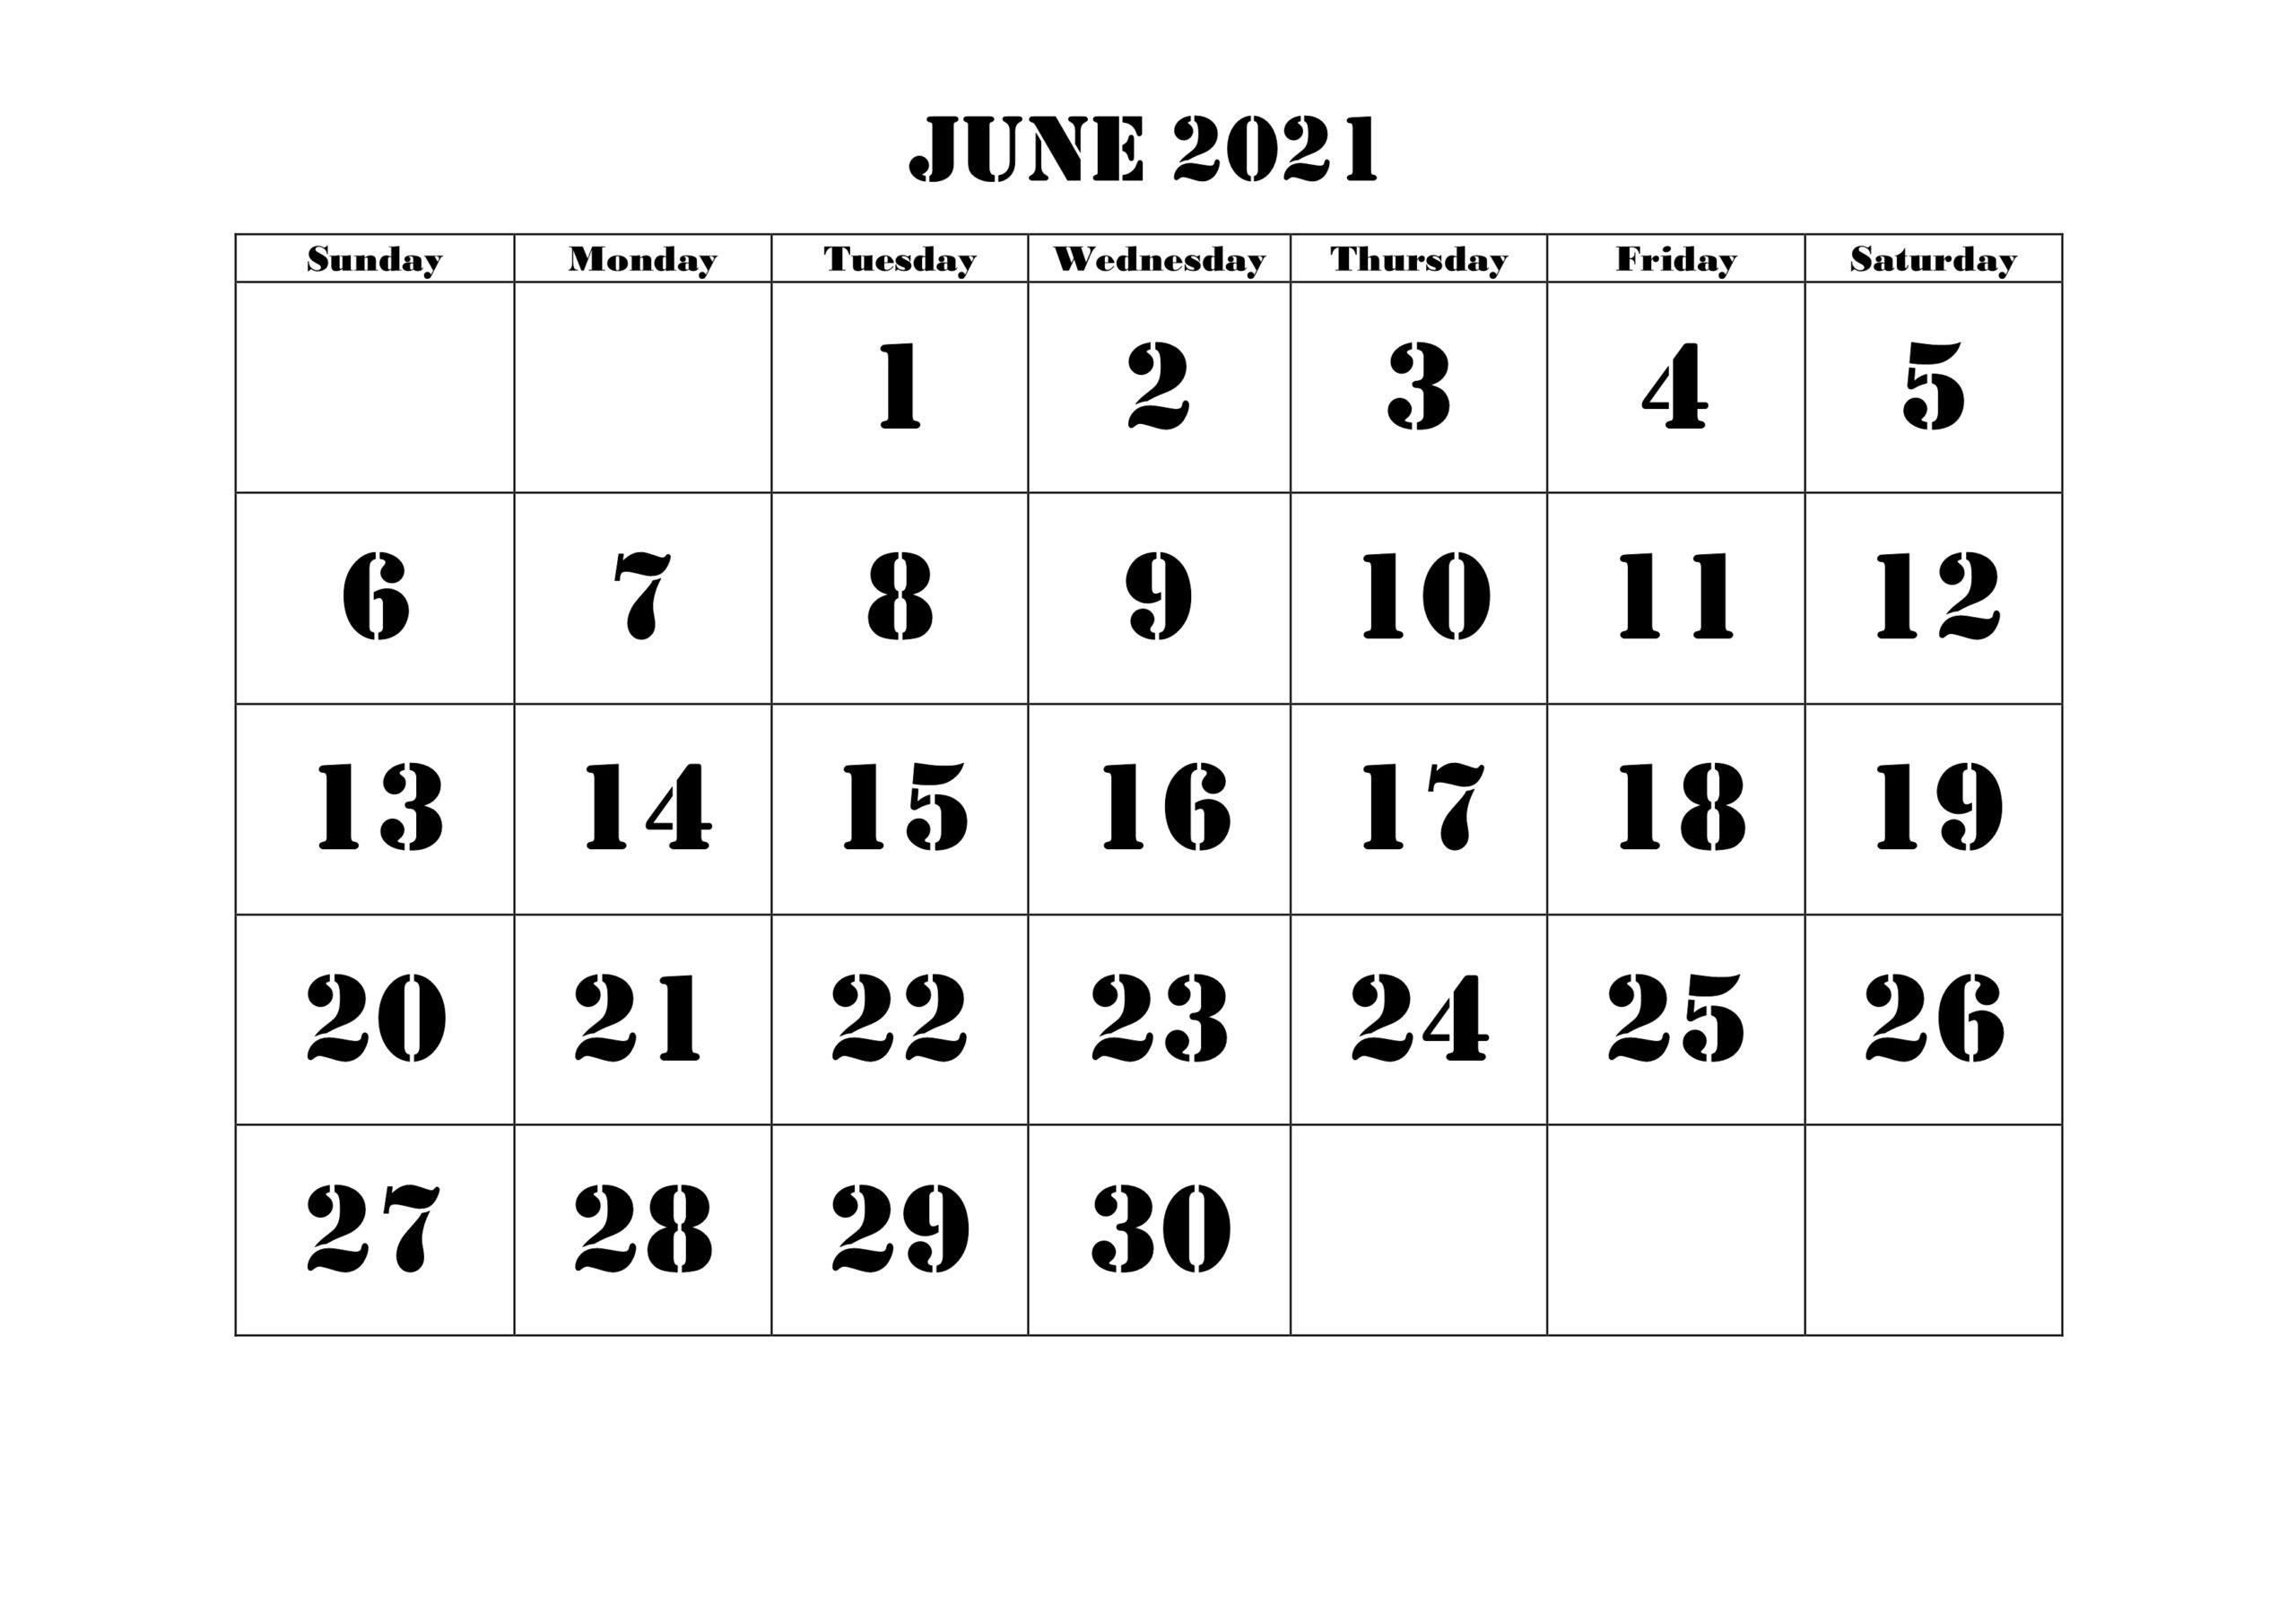 Blank June 2021 Calendar Make Schedule - Thecalendarpedia June 2021 Calendar Printable